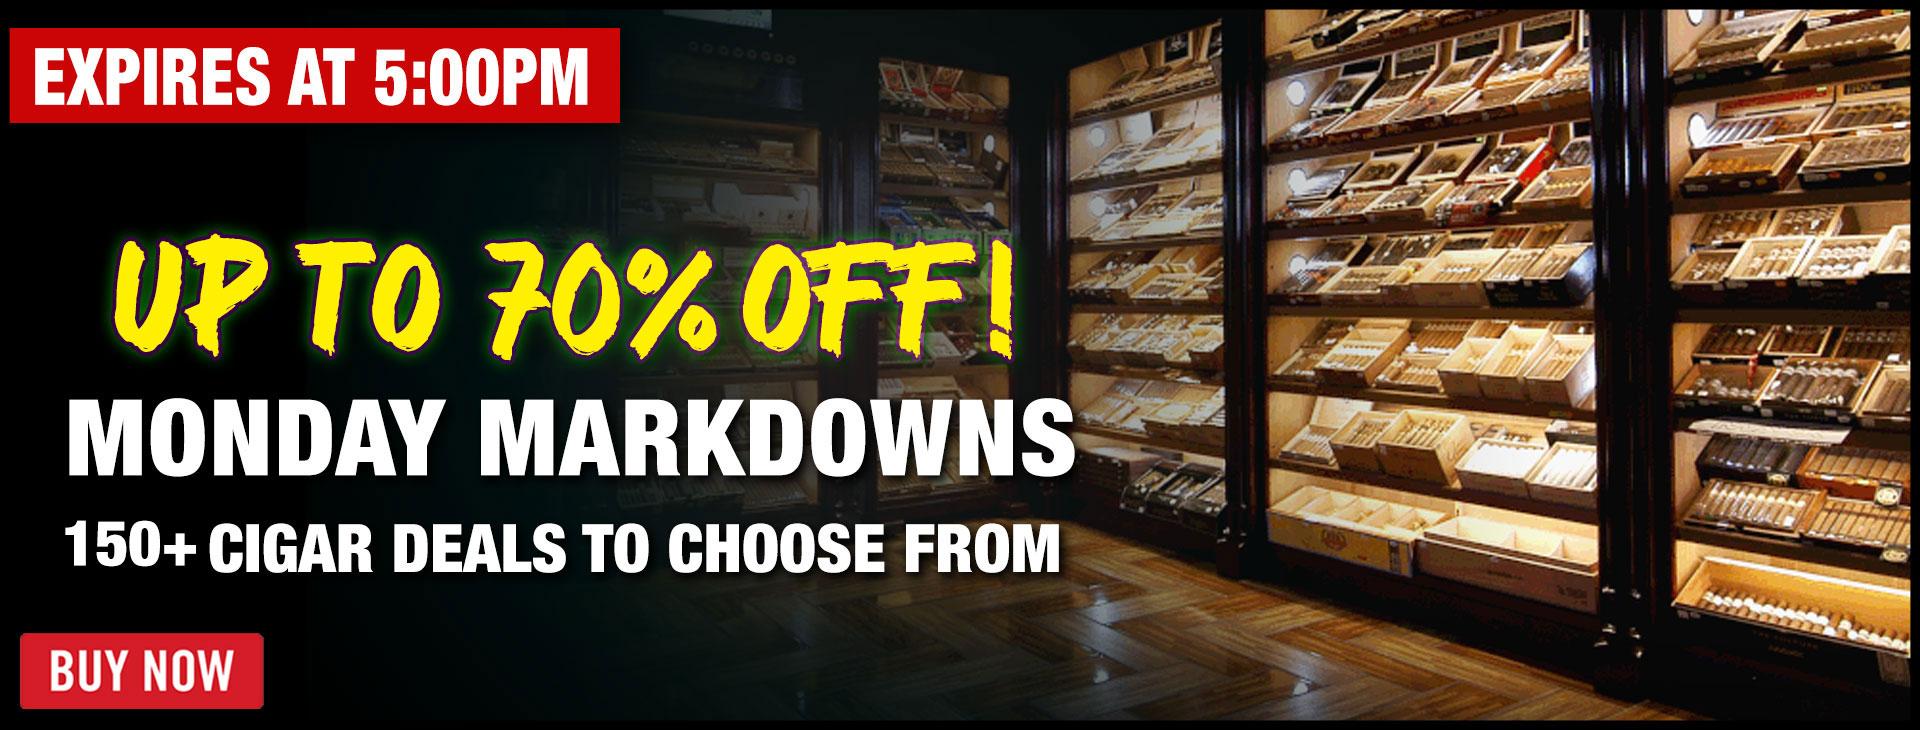 monday-markdown-2021-2-banner.jpg